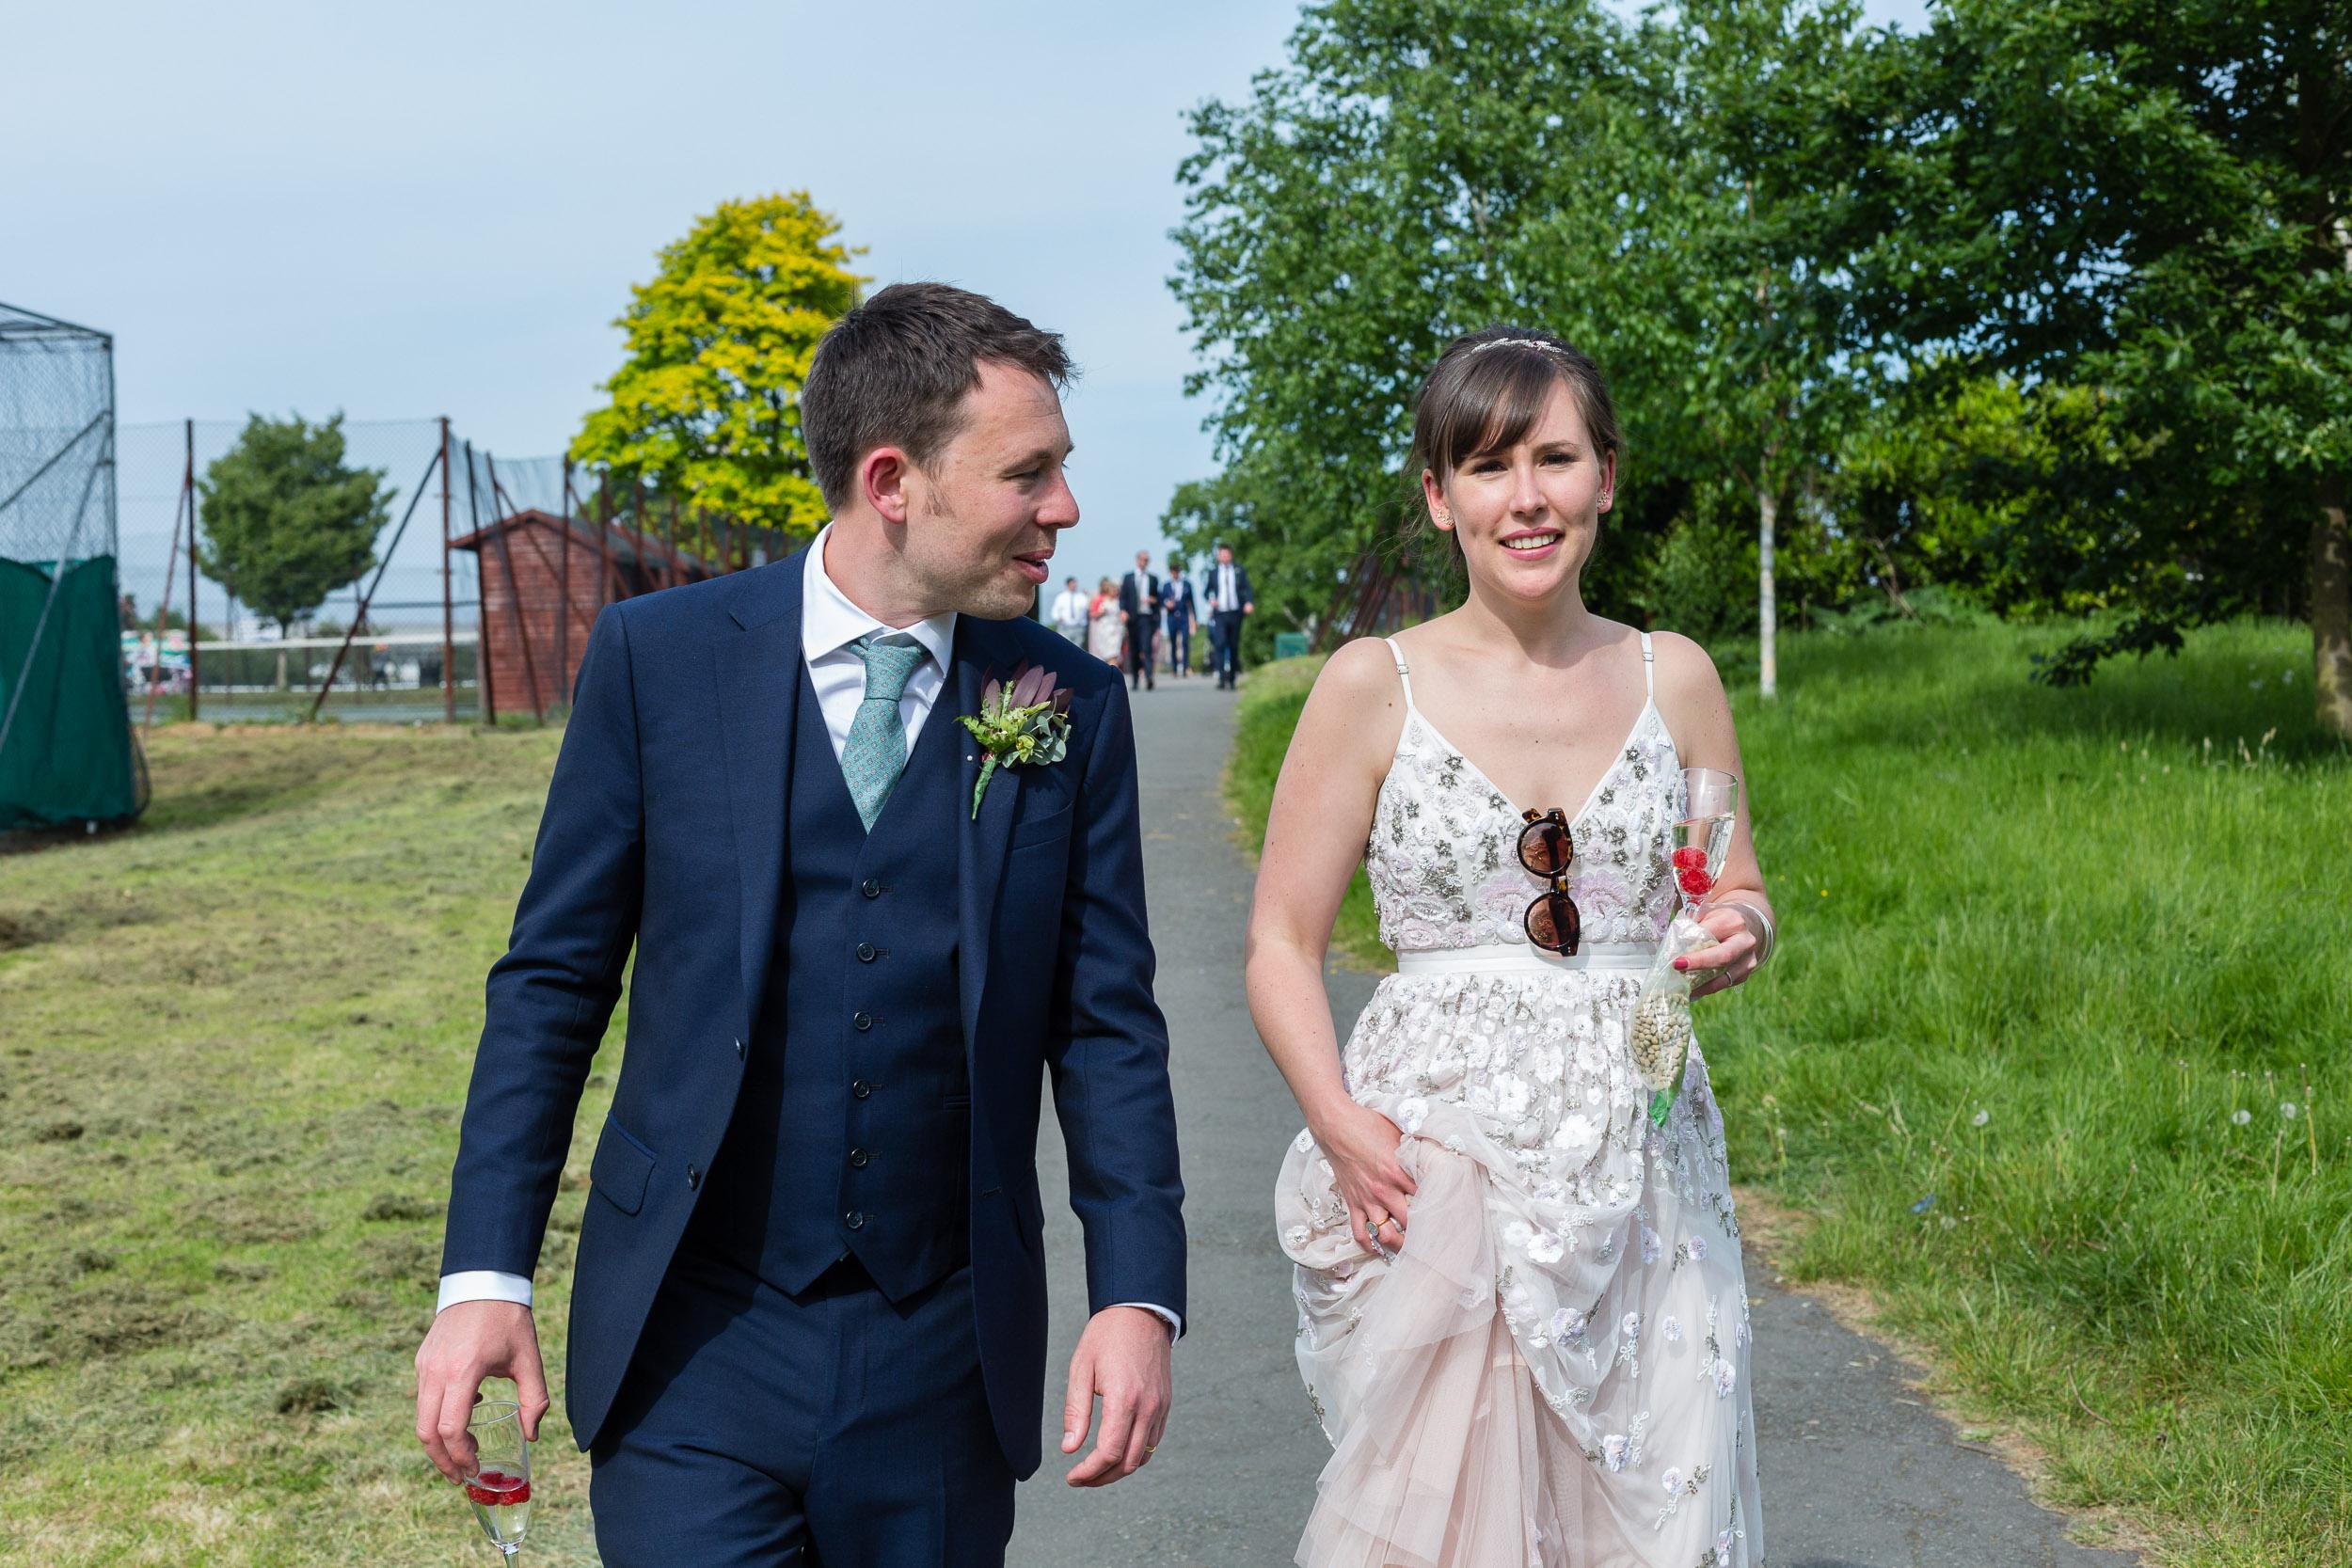 brockwell-lido-brixton-herne-hill-wedding-253.jpg